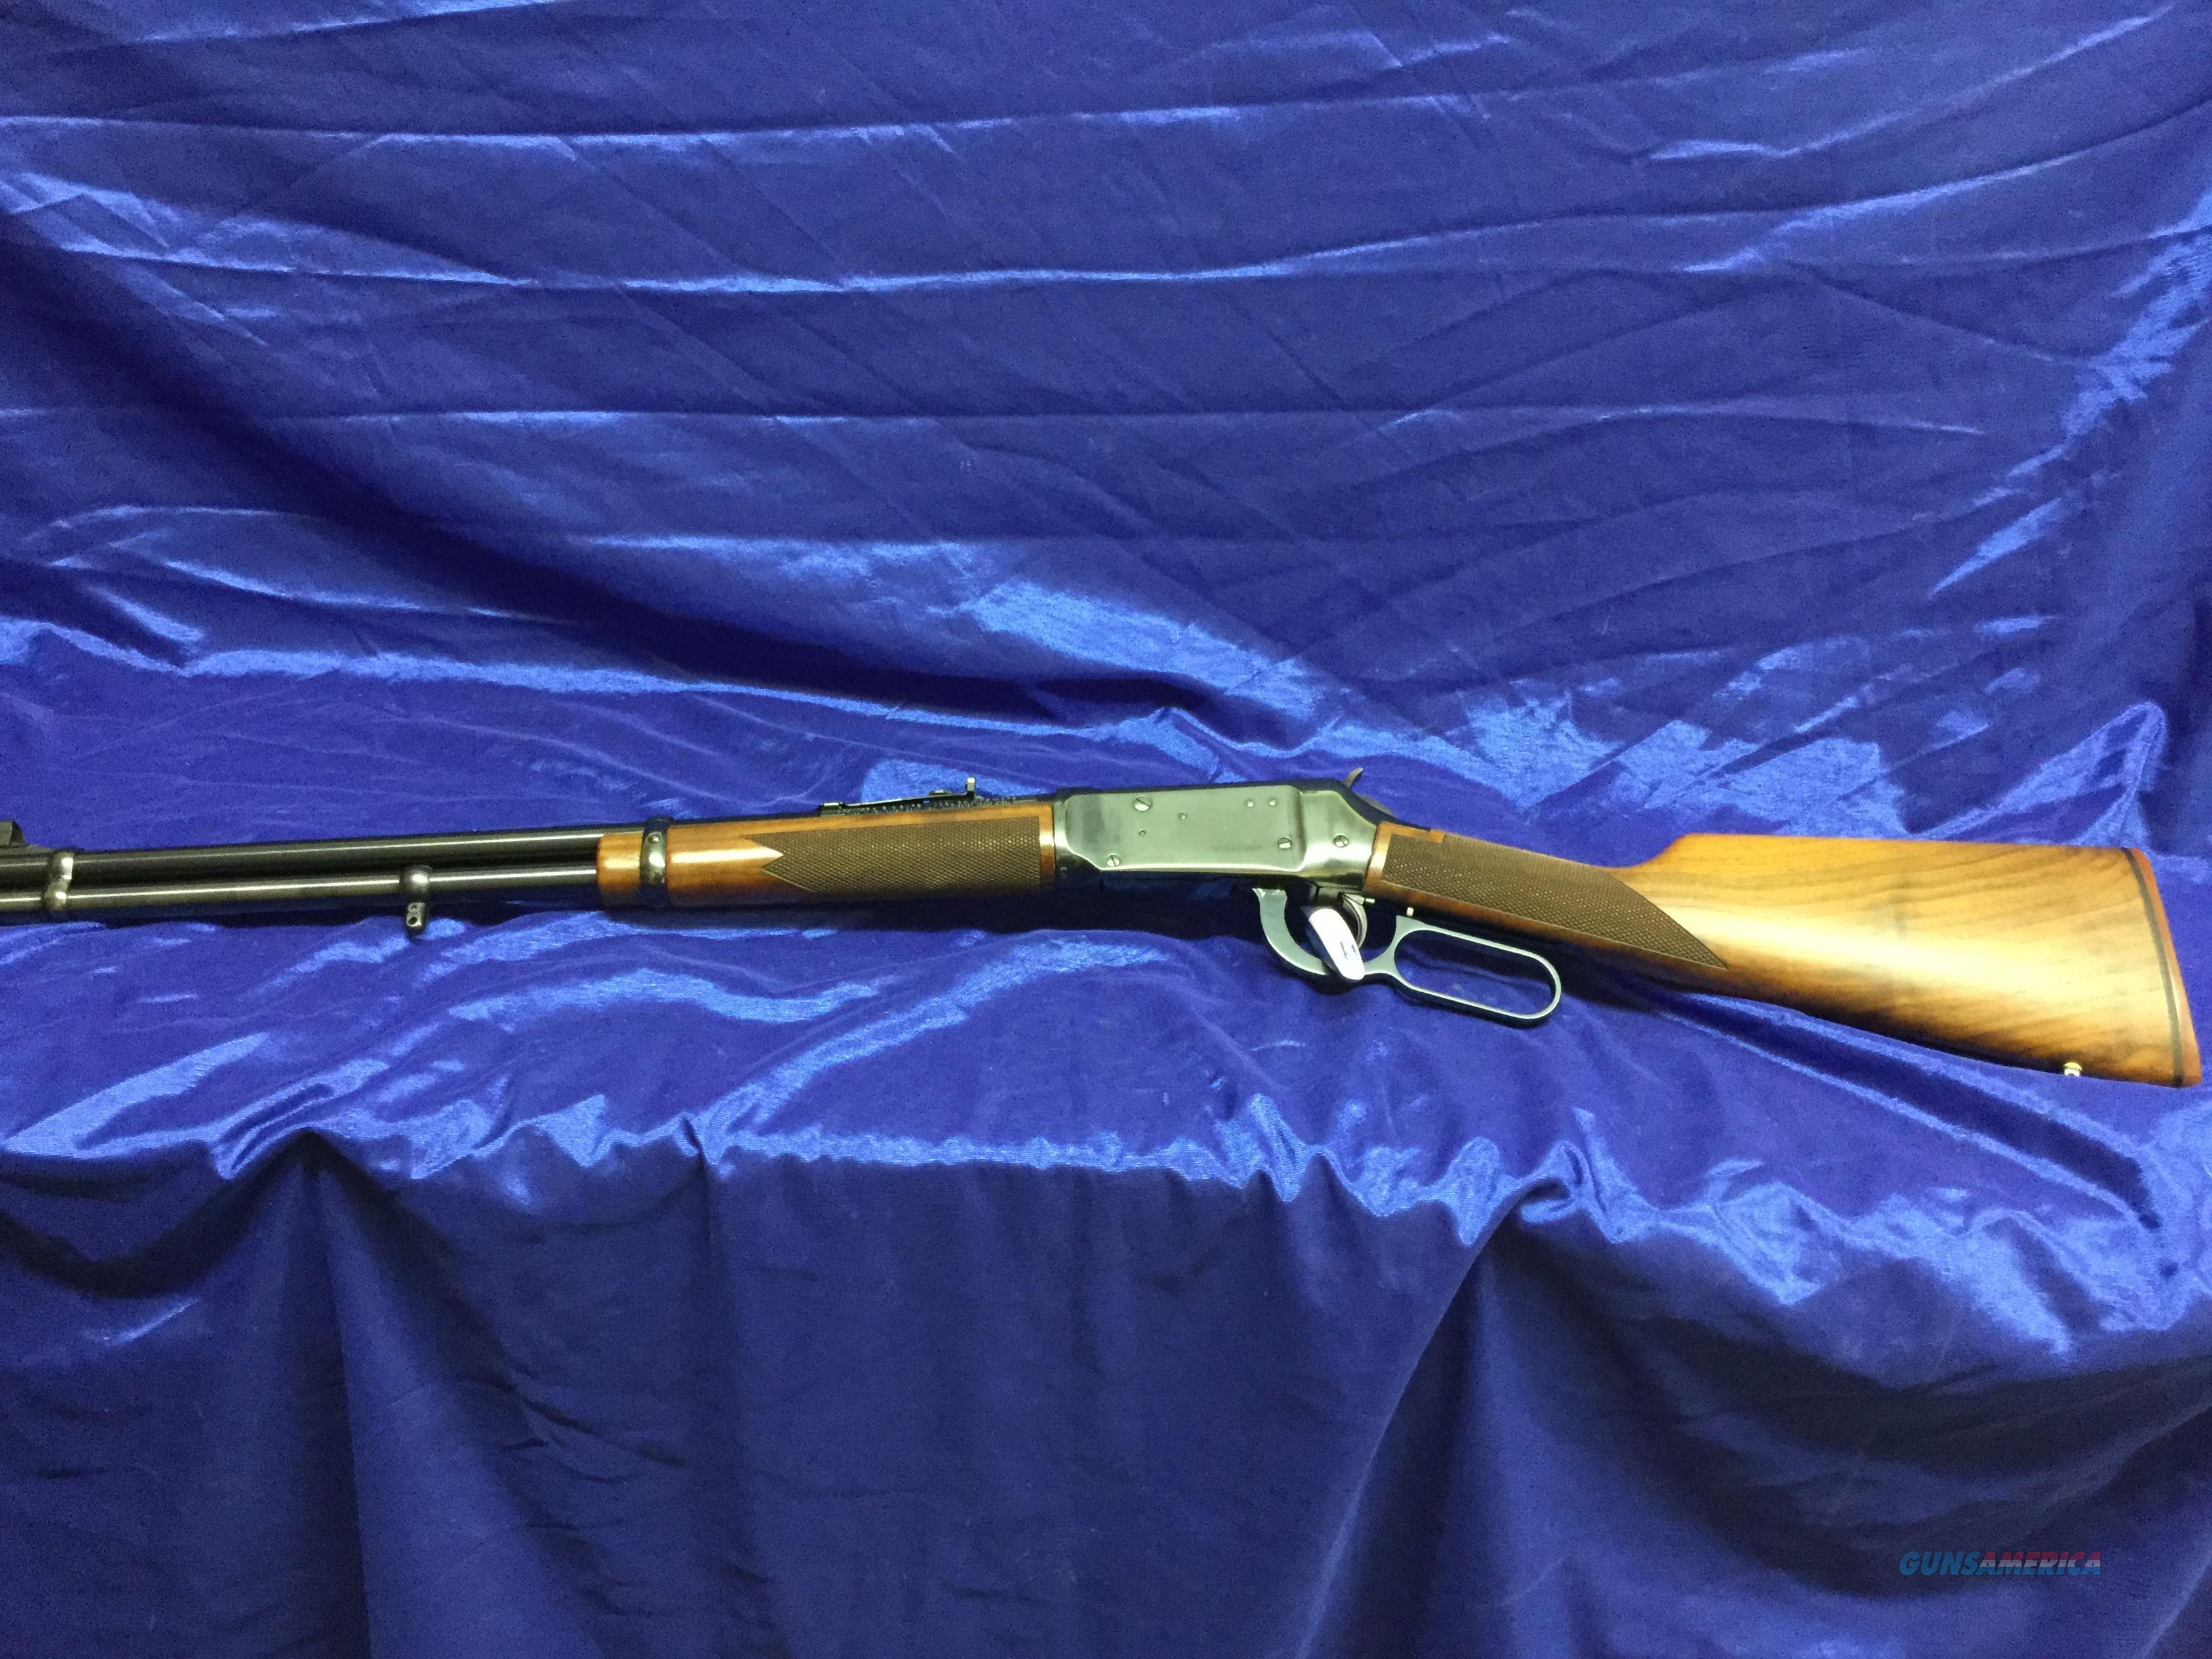 Big Bore 94 XTR .375 Win.  Guns > Rifles > Winchester Rifles - Modern Lever > Model 94 > Post-64